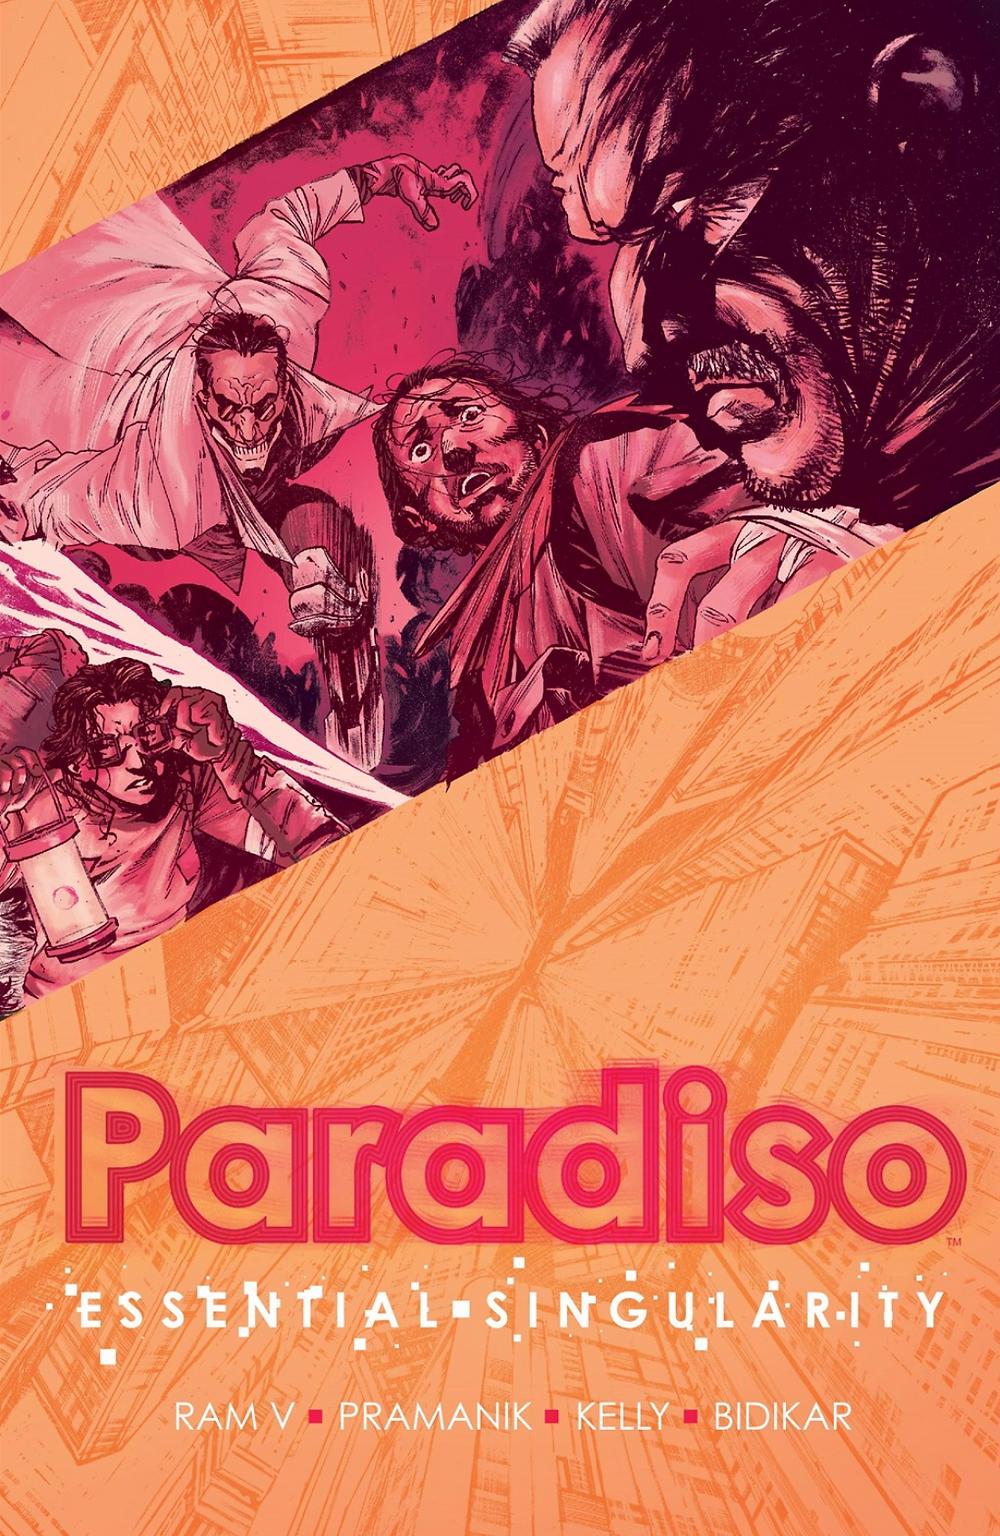 Paradiso, Vol. 1, cover, Image, Ram V/Pramanik